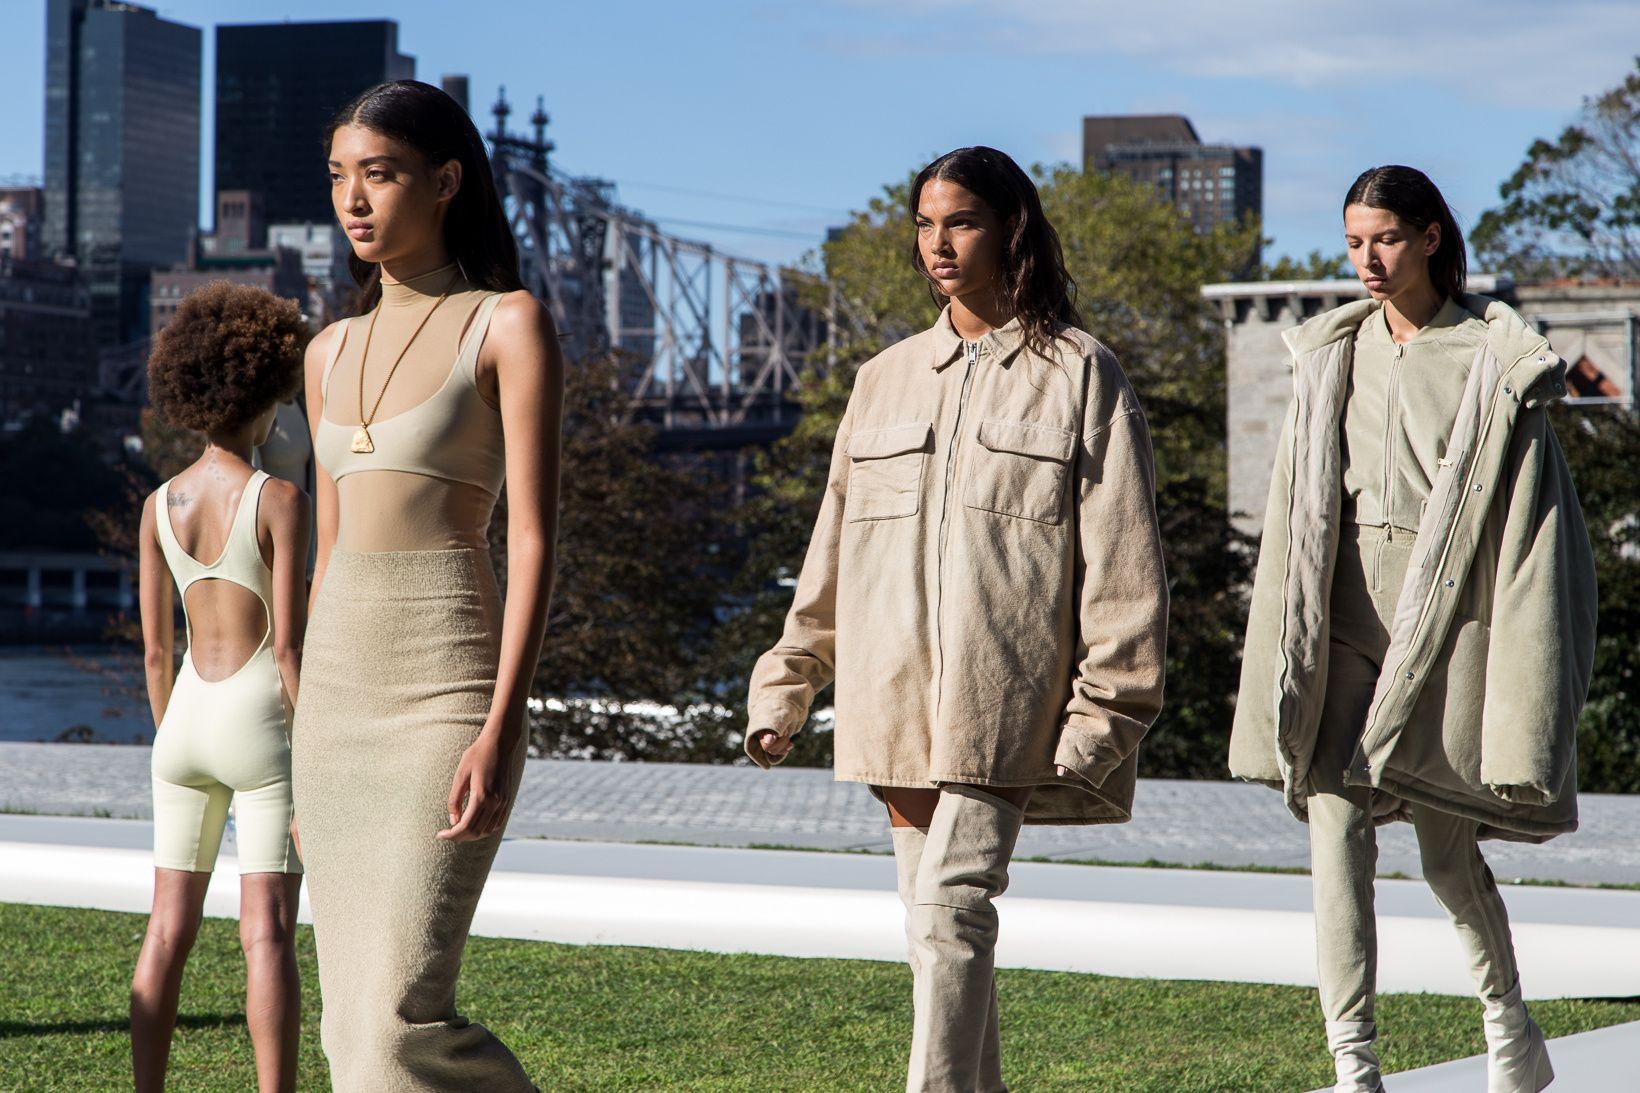 Kanye West S Yeezy Season 4 Brought Sunshine To An Urban Dystopia Yeezy Fashion Yeezy Fashion Women Yeezy Season